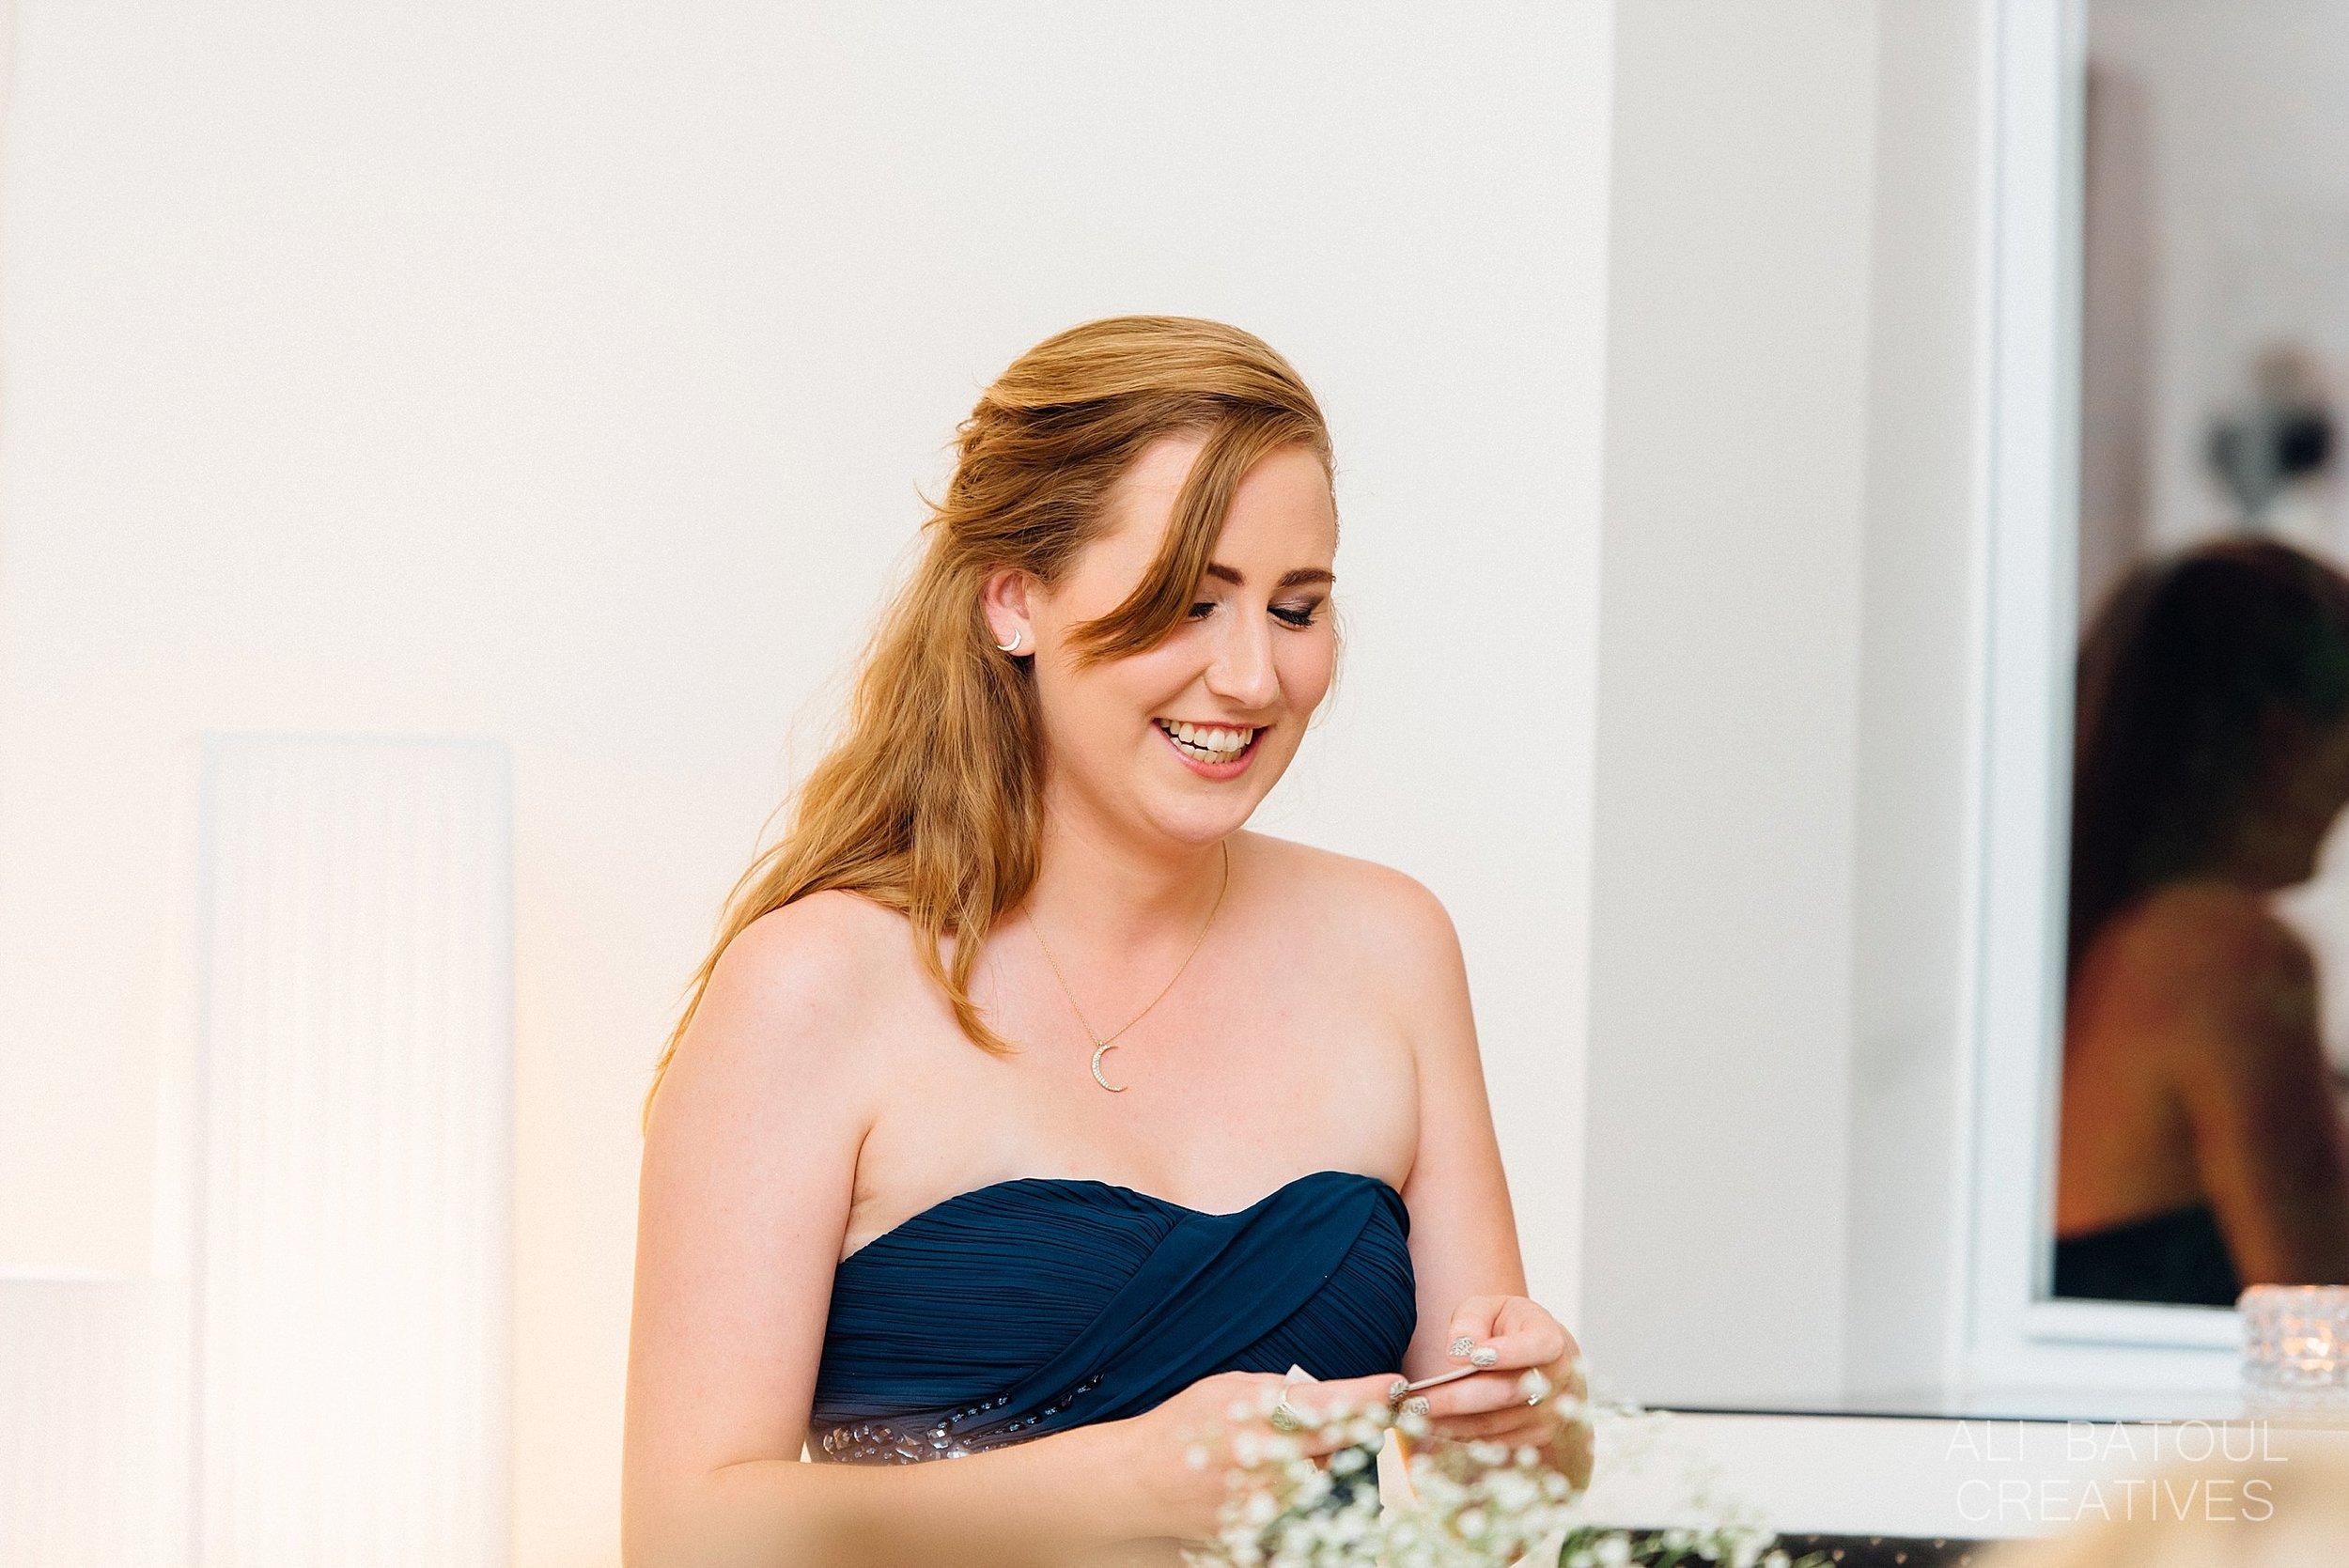 Jocelyn + Steve At The Schoolhouse Wedding - Ali and Batoul Fine Art Wedding Photography_0092.jpg